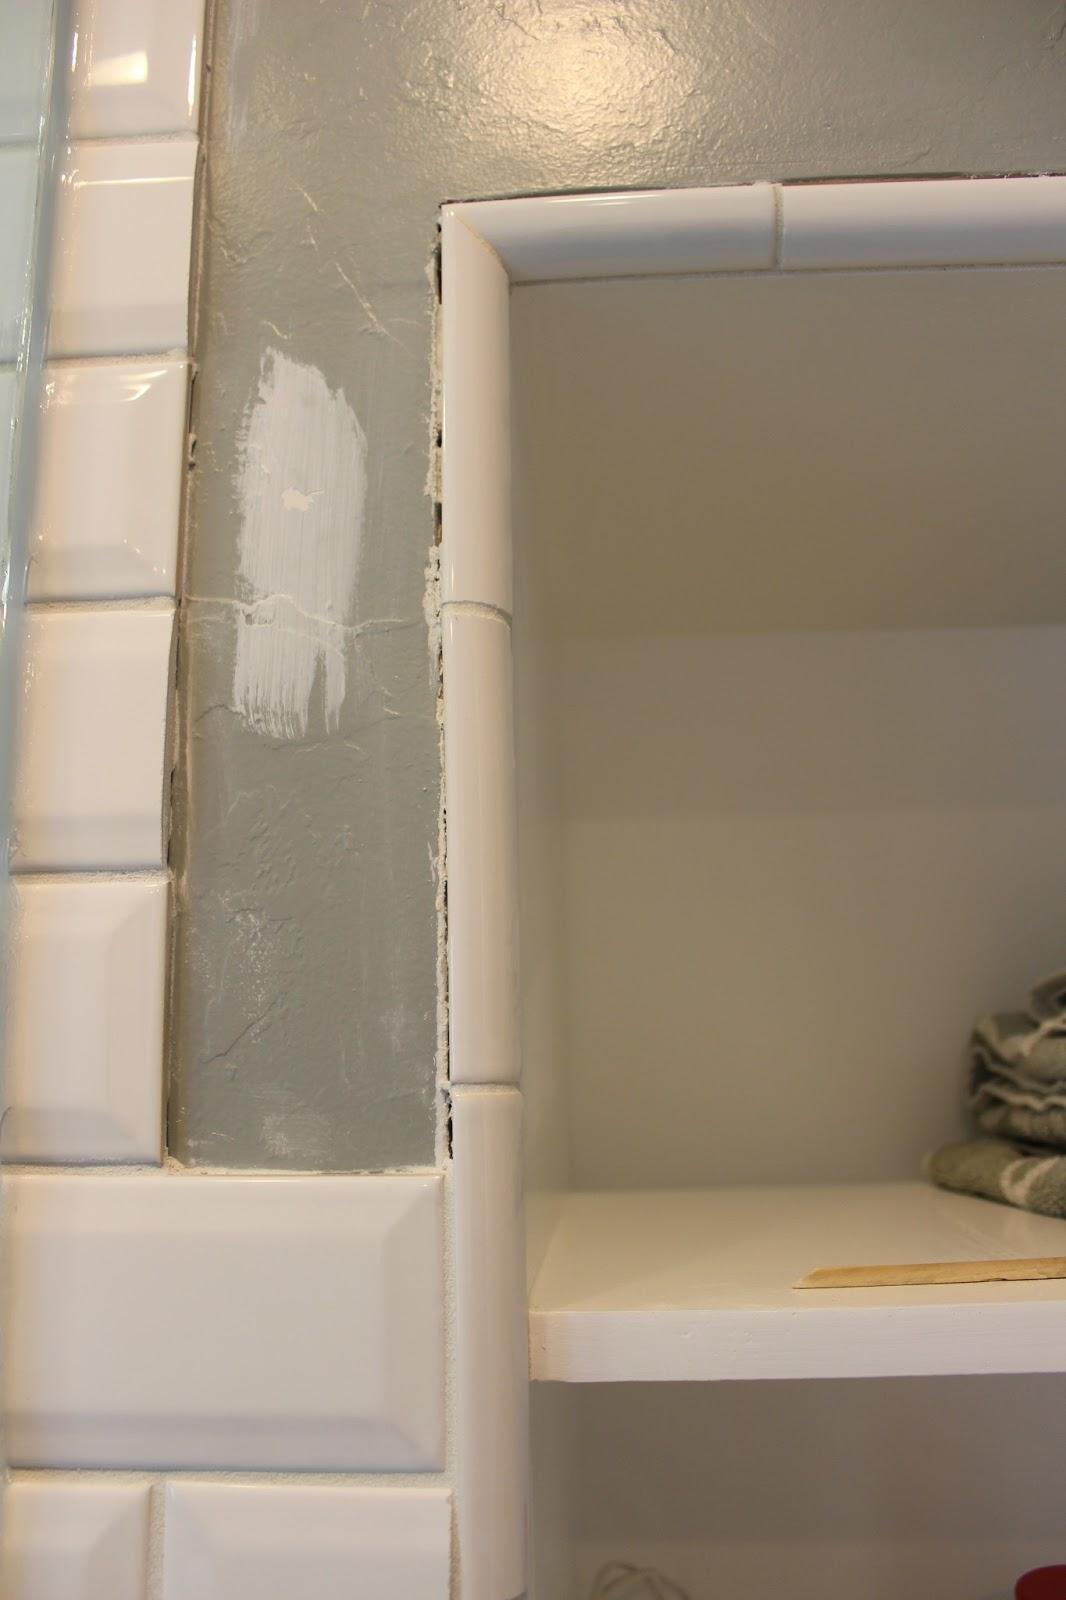 Bathroom Tile Quarter Round those last bathroom to do list items